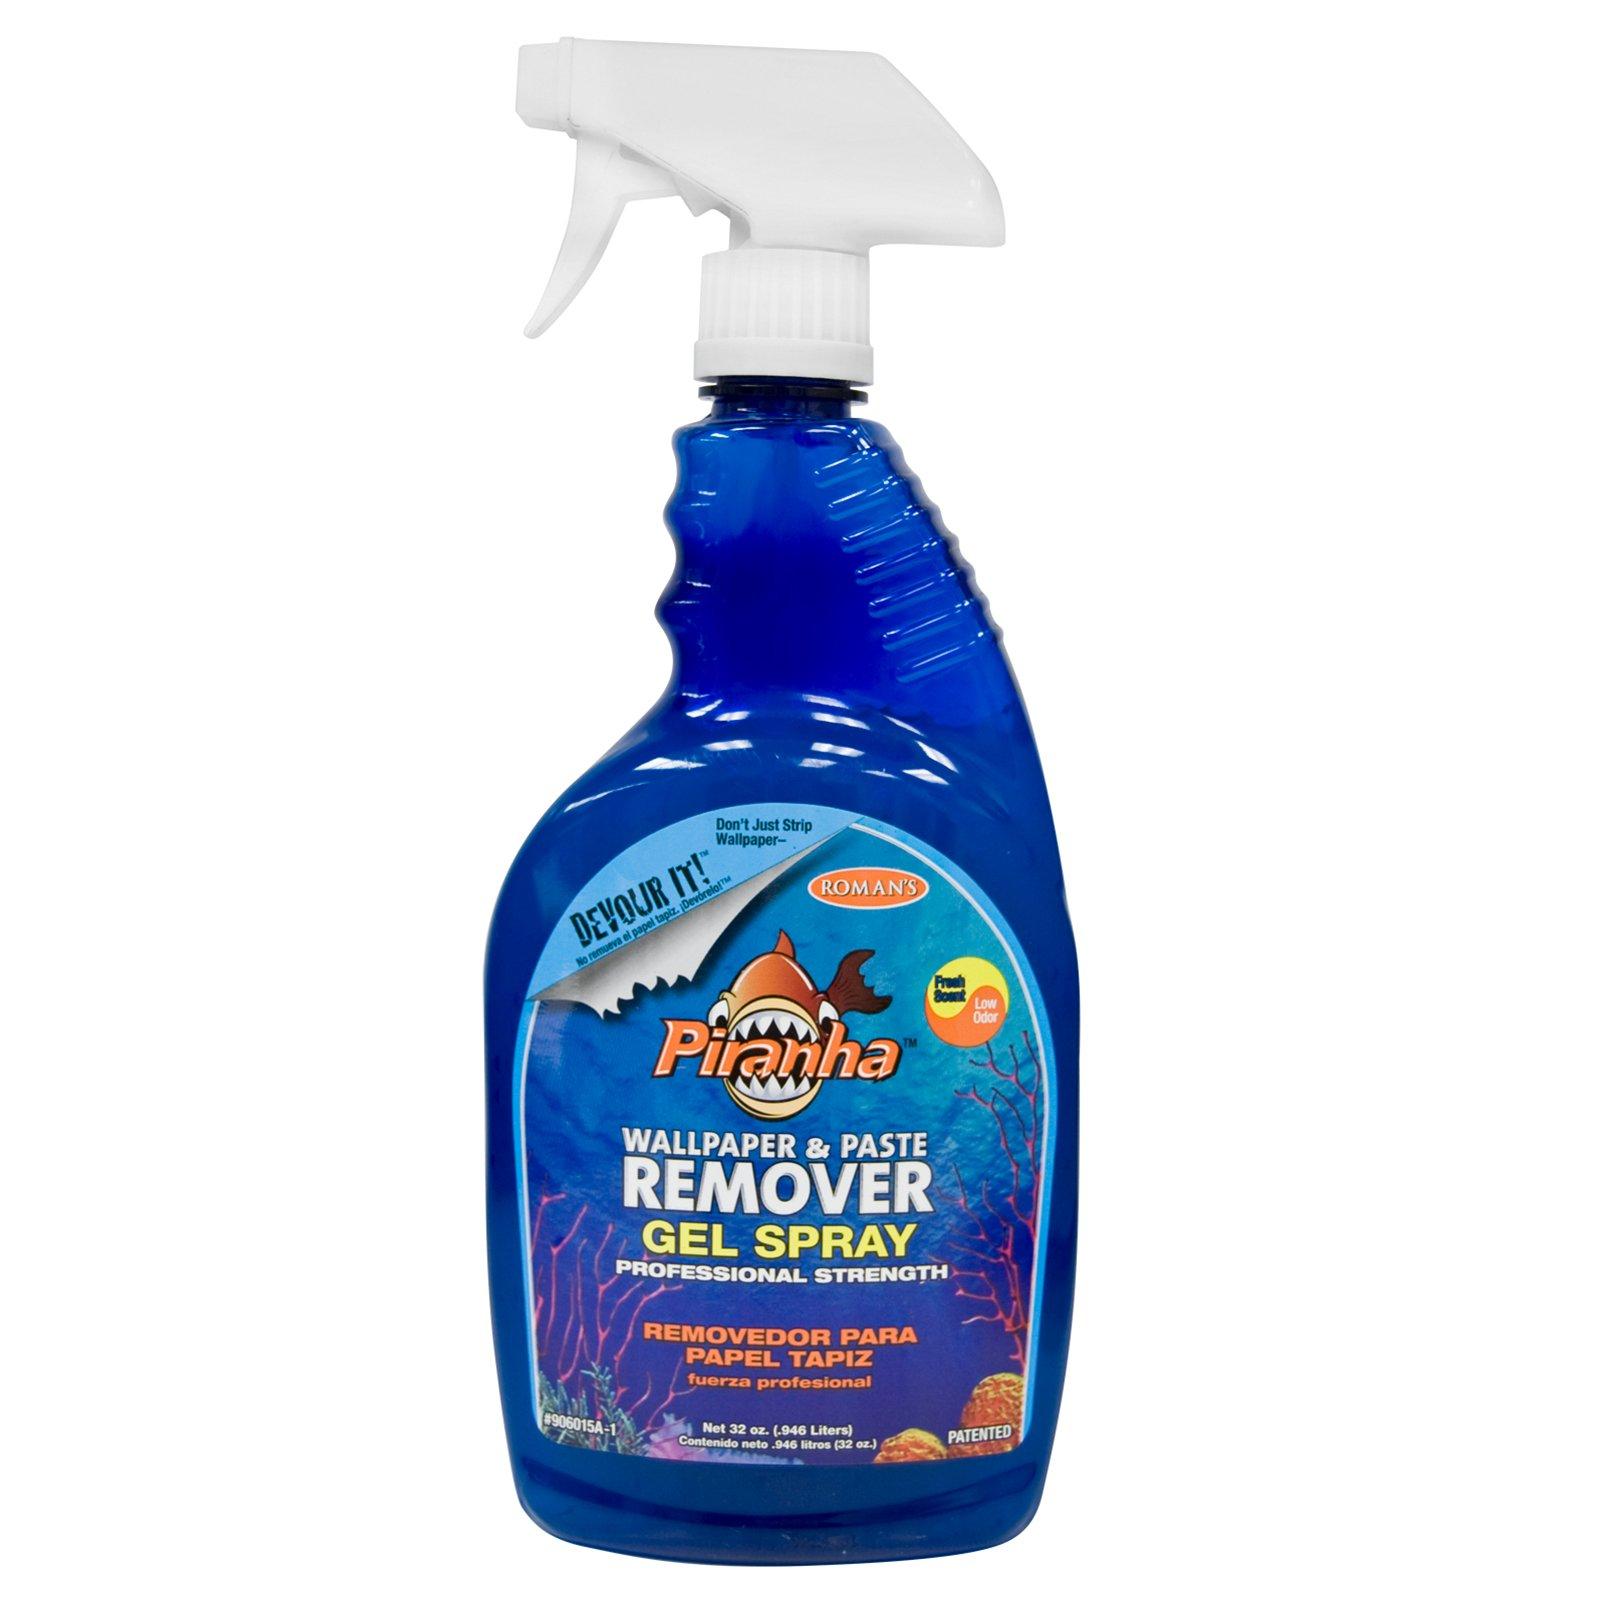 Piranha 206015 32 oz. Gel Spray Wallpaper and Paste Remover